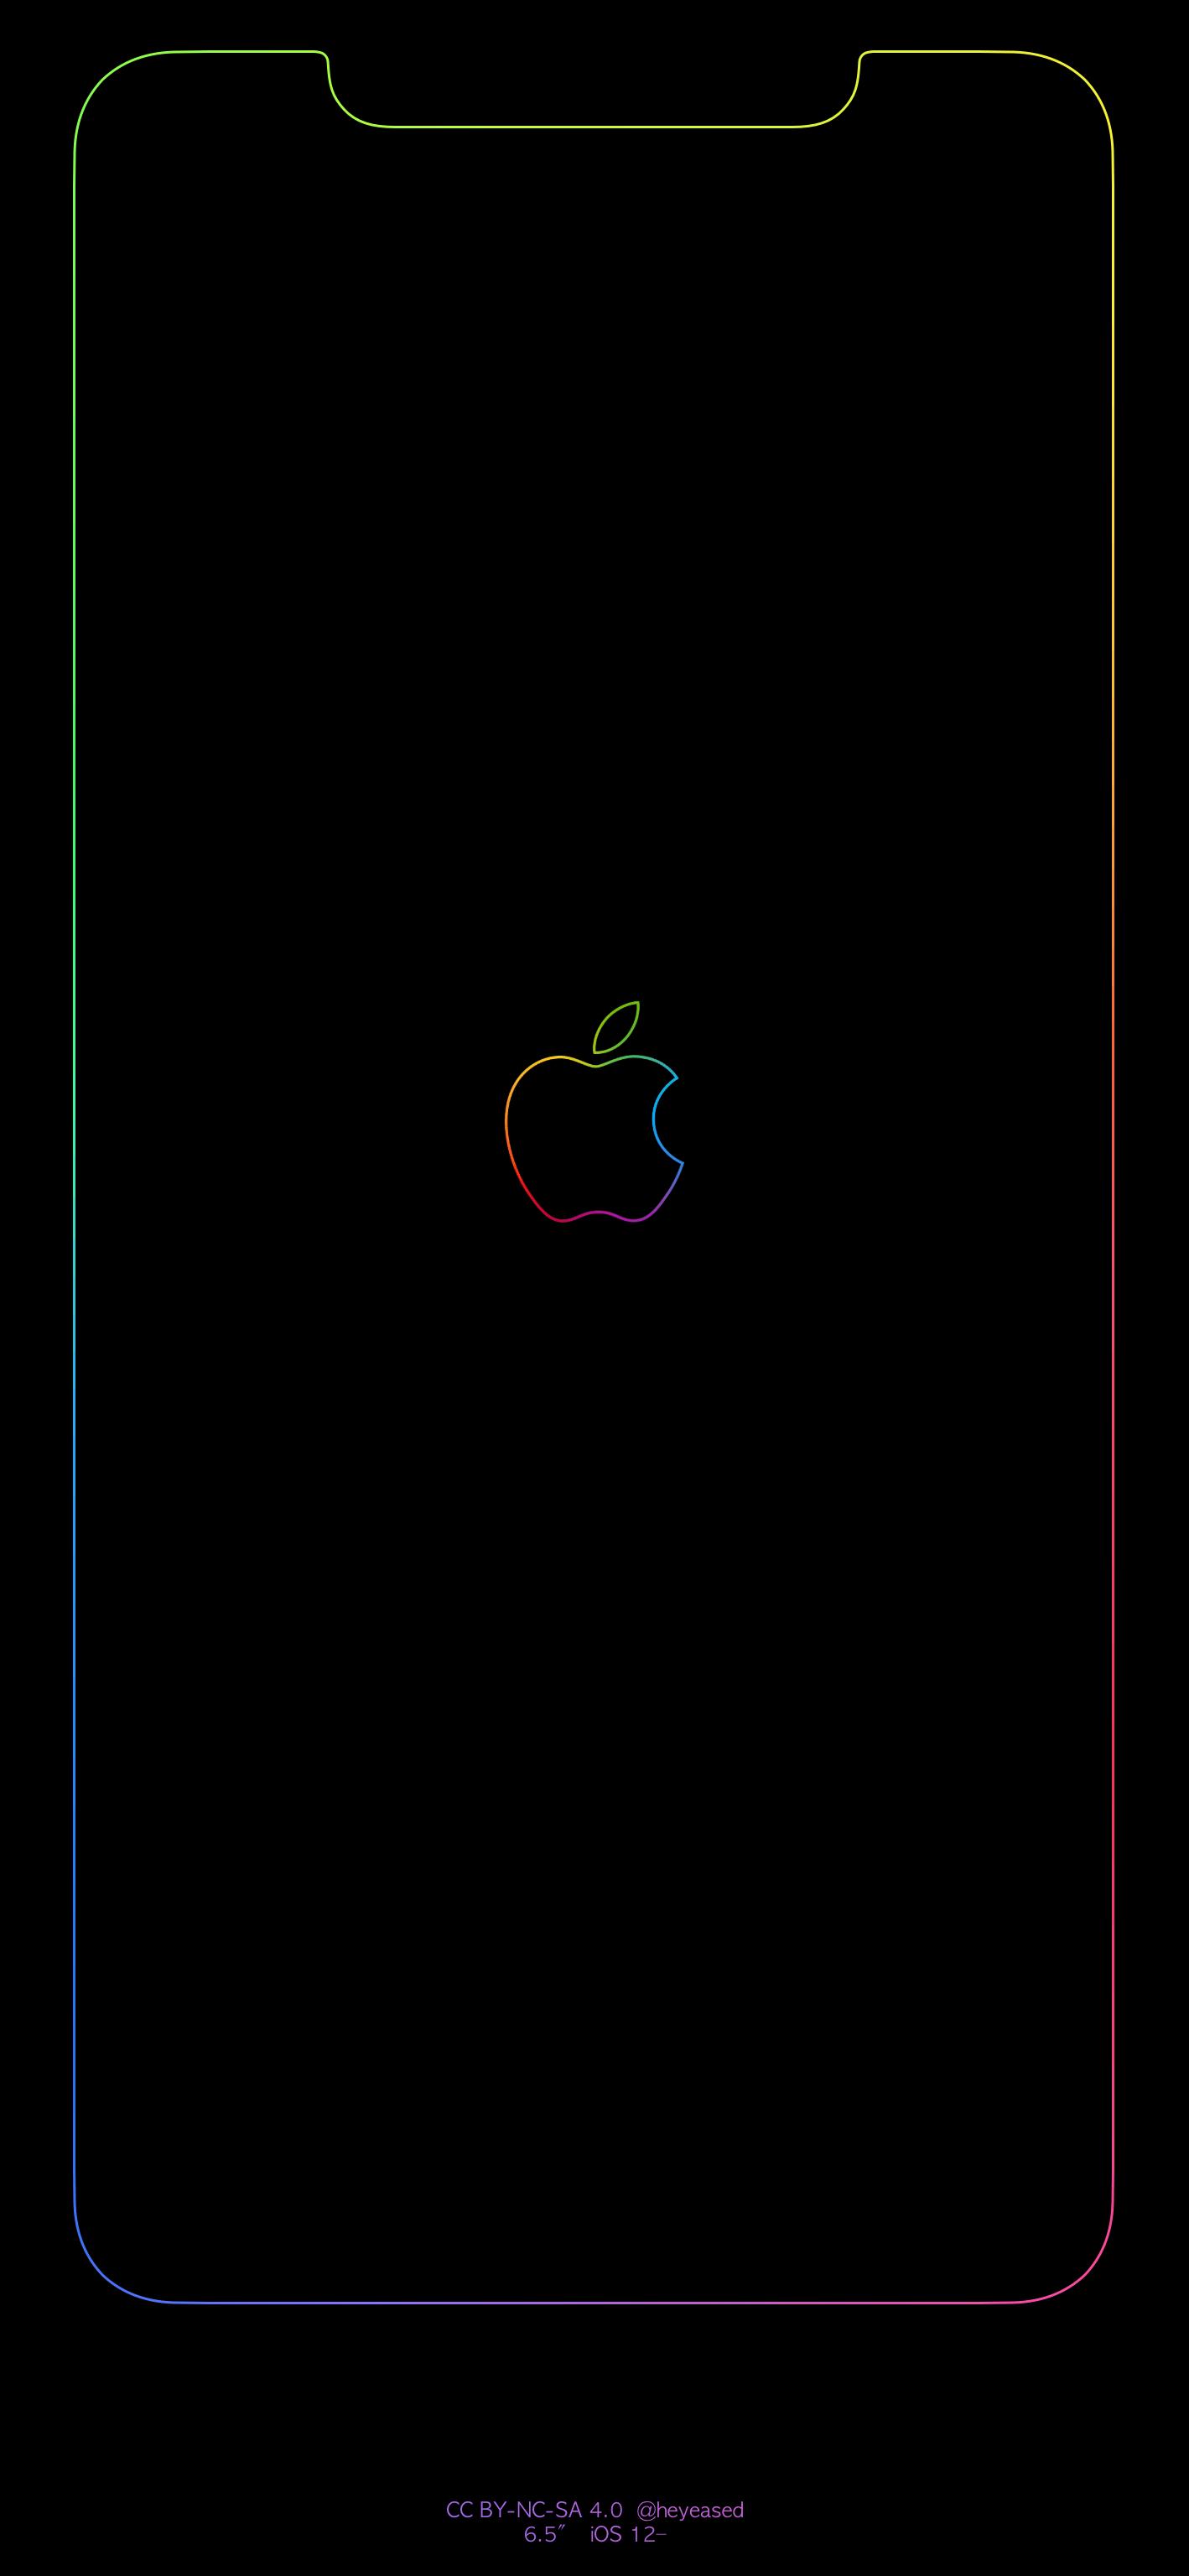 Rainbow Apple Logo Wallpapers Top Free Rainbow Apple Logo Backgrounds Wallpaperaccess